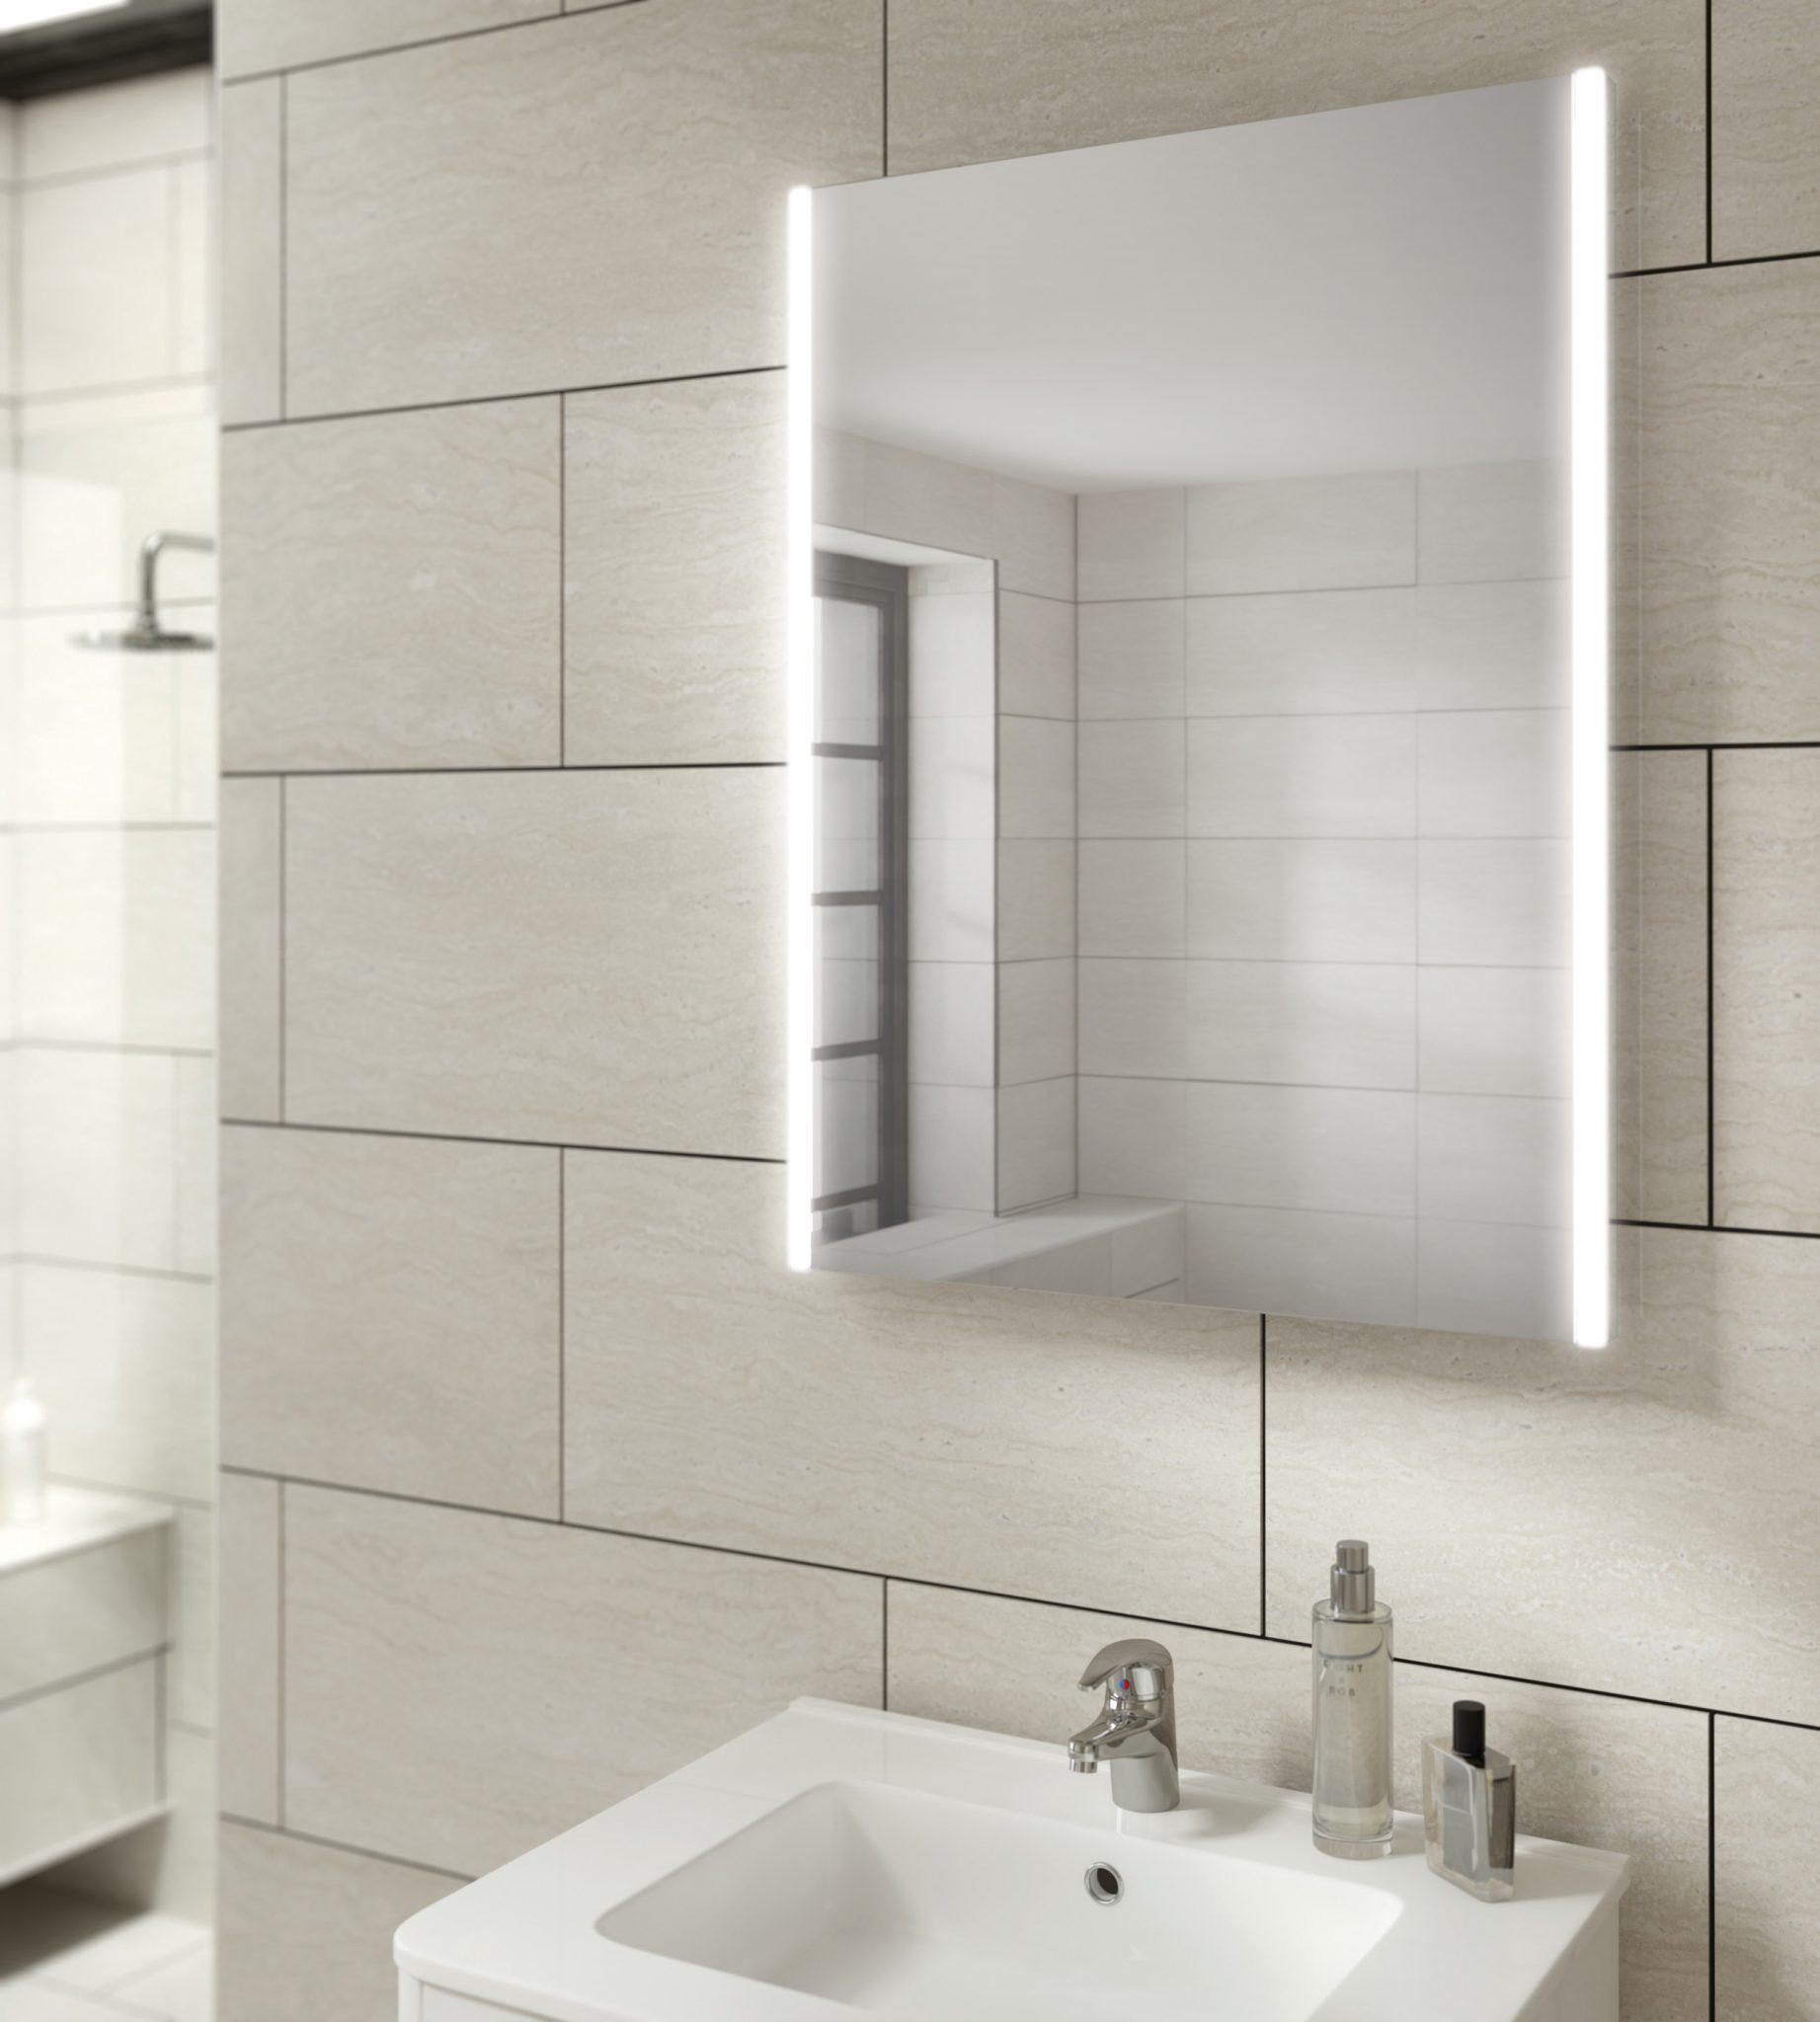 HiB - Herts Bathrooms